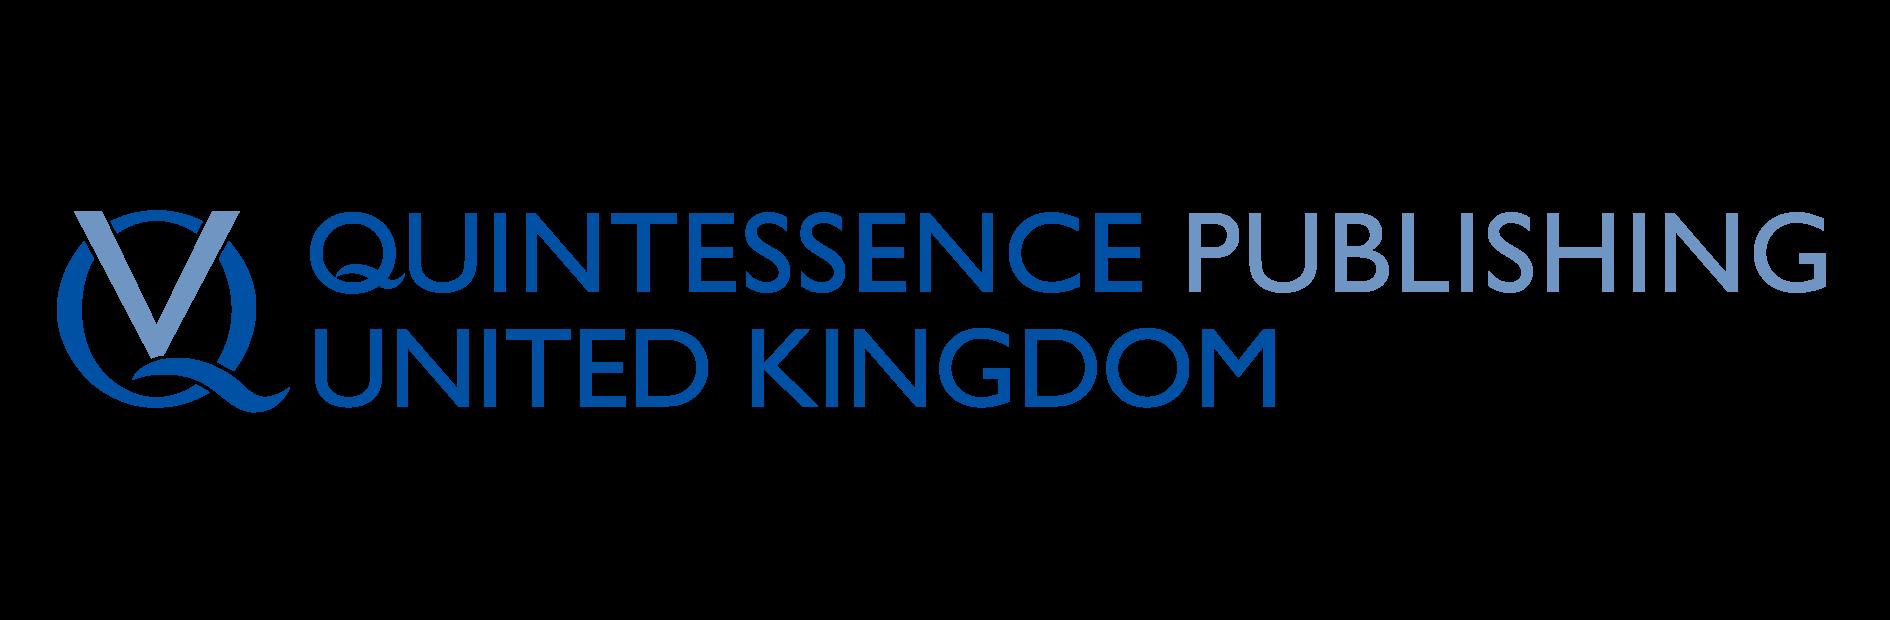 Quintessence Publishing Co., Ltd.